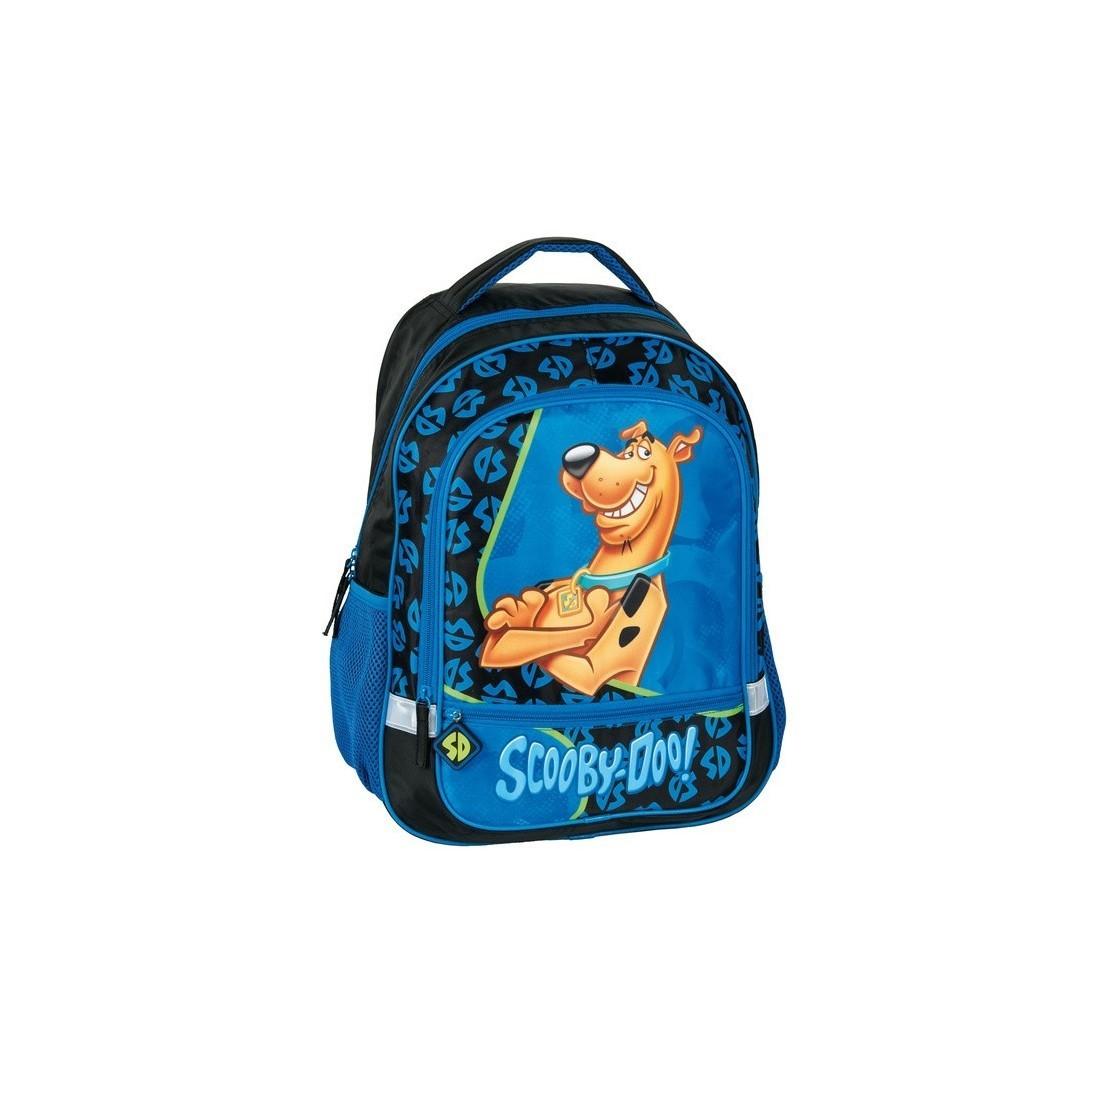 bc4d89bf81a45 Plecak szkolny Scooby-Doo niebieski - plecak-tornister.pl